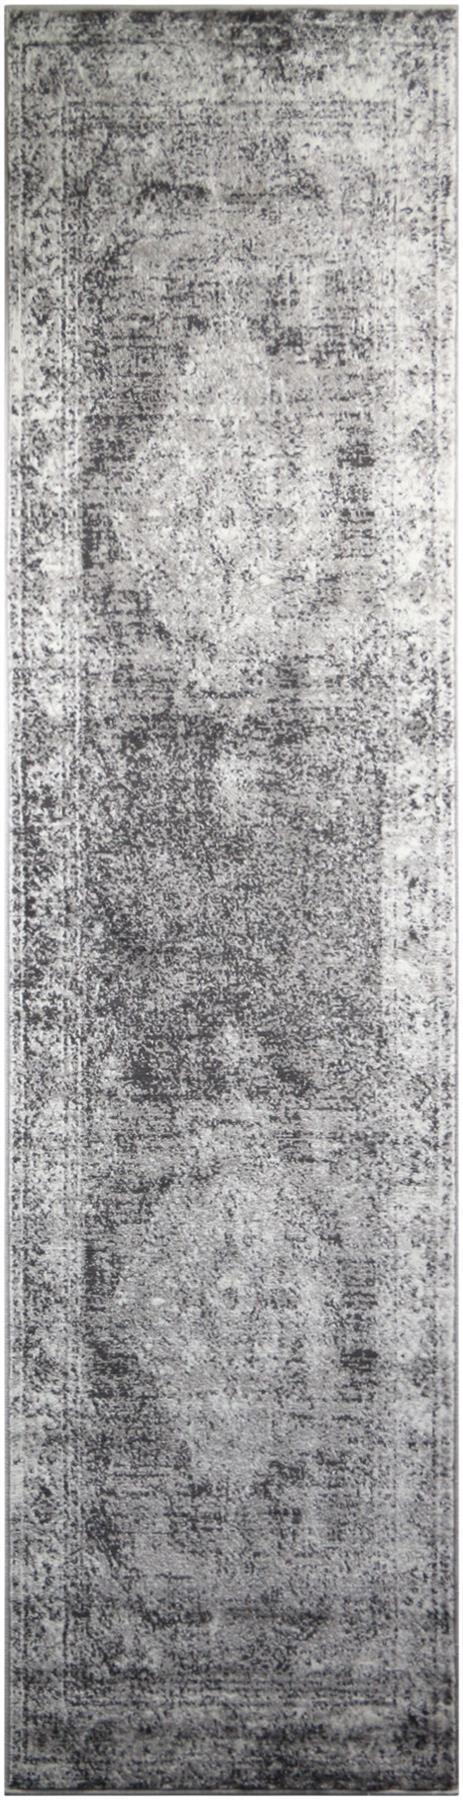 Large-Grey-Living-Room-Rugs-Medallion-Design-New-Classic-Modern-Hallway-Runners thumbnail 16